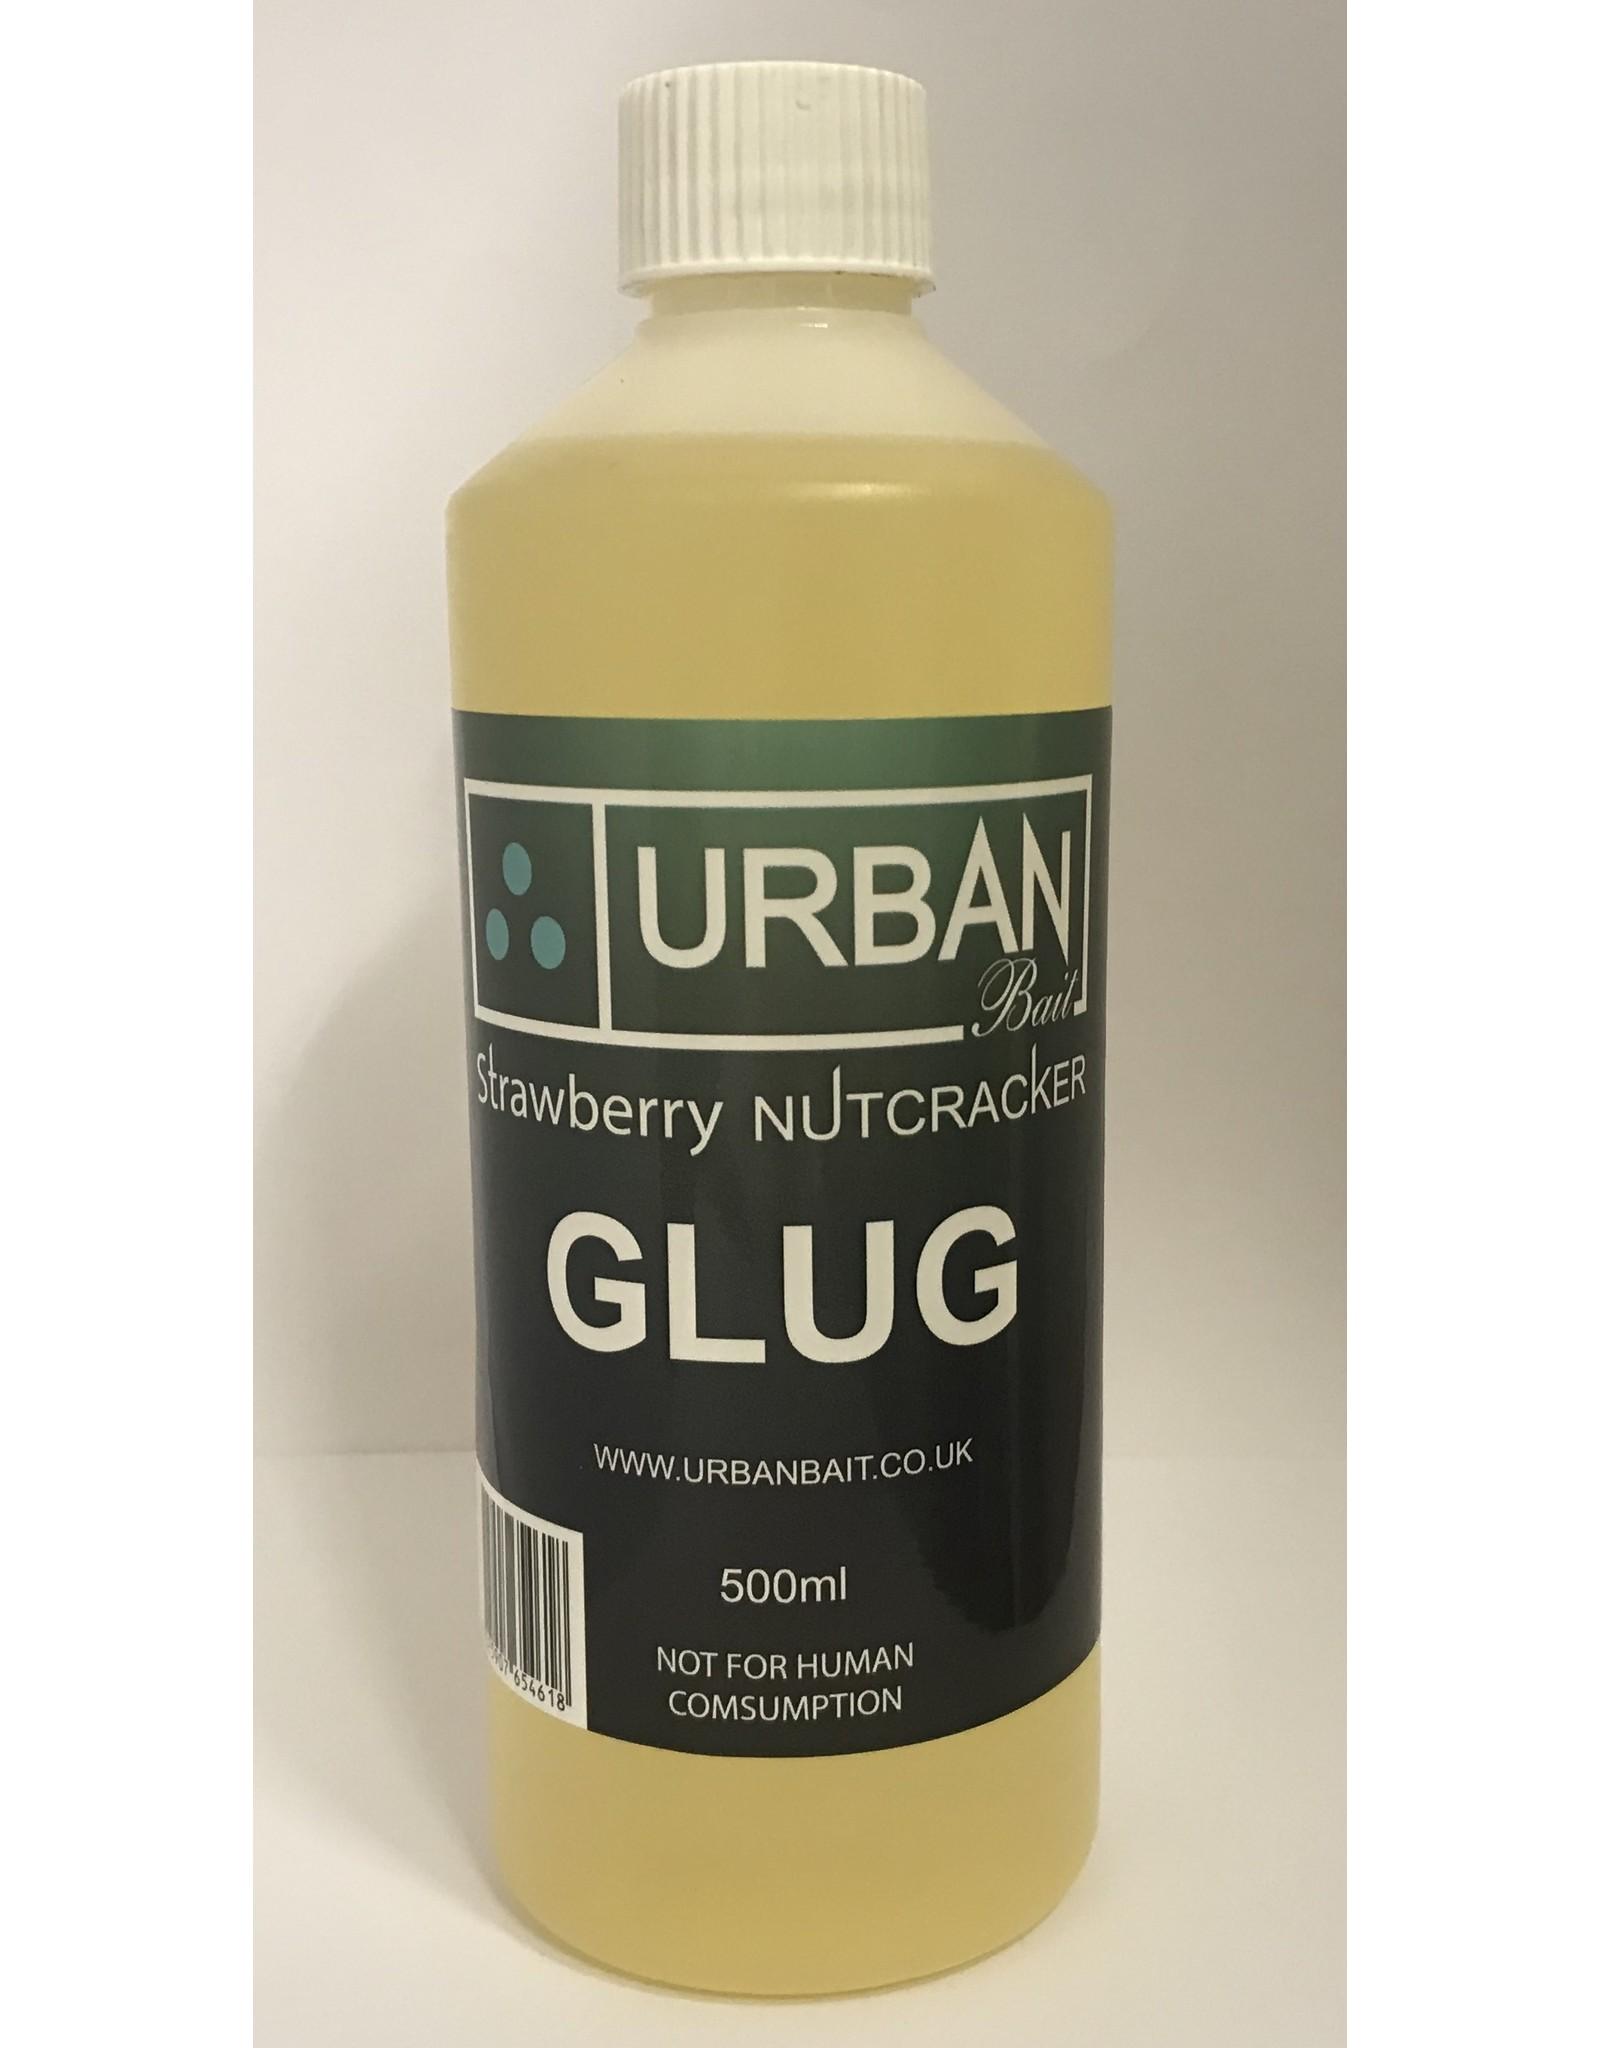 Urban Bait Urban Bait Strawberry Nutcracker Glug 500ml